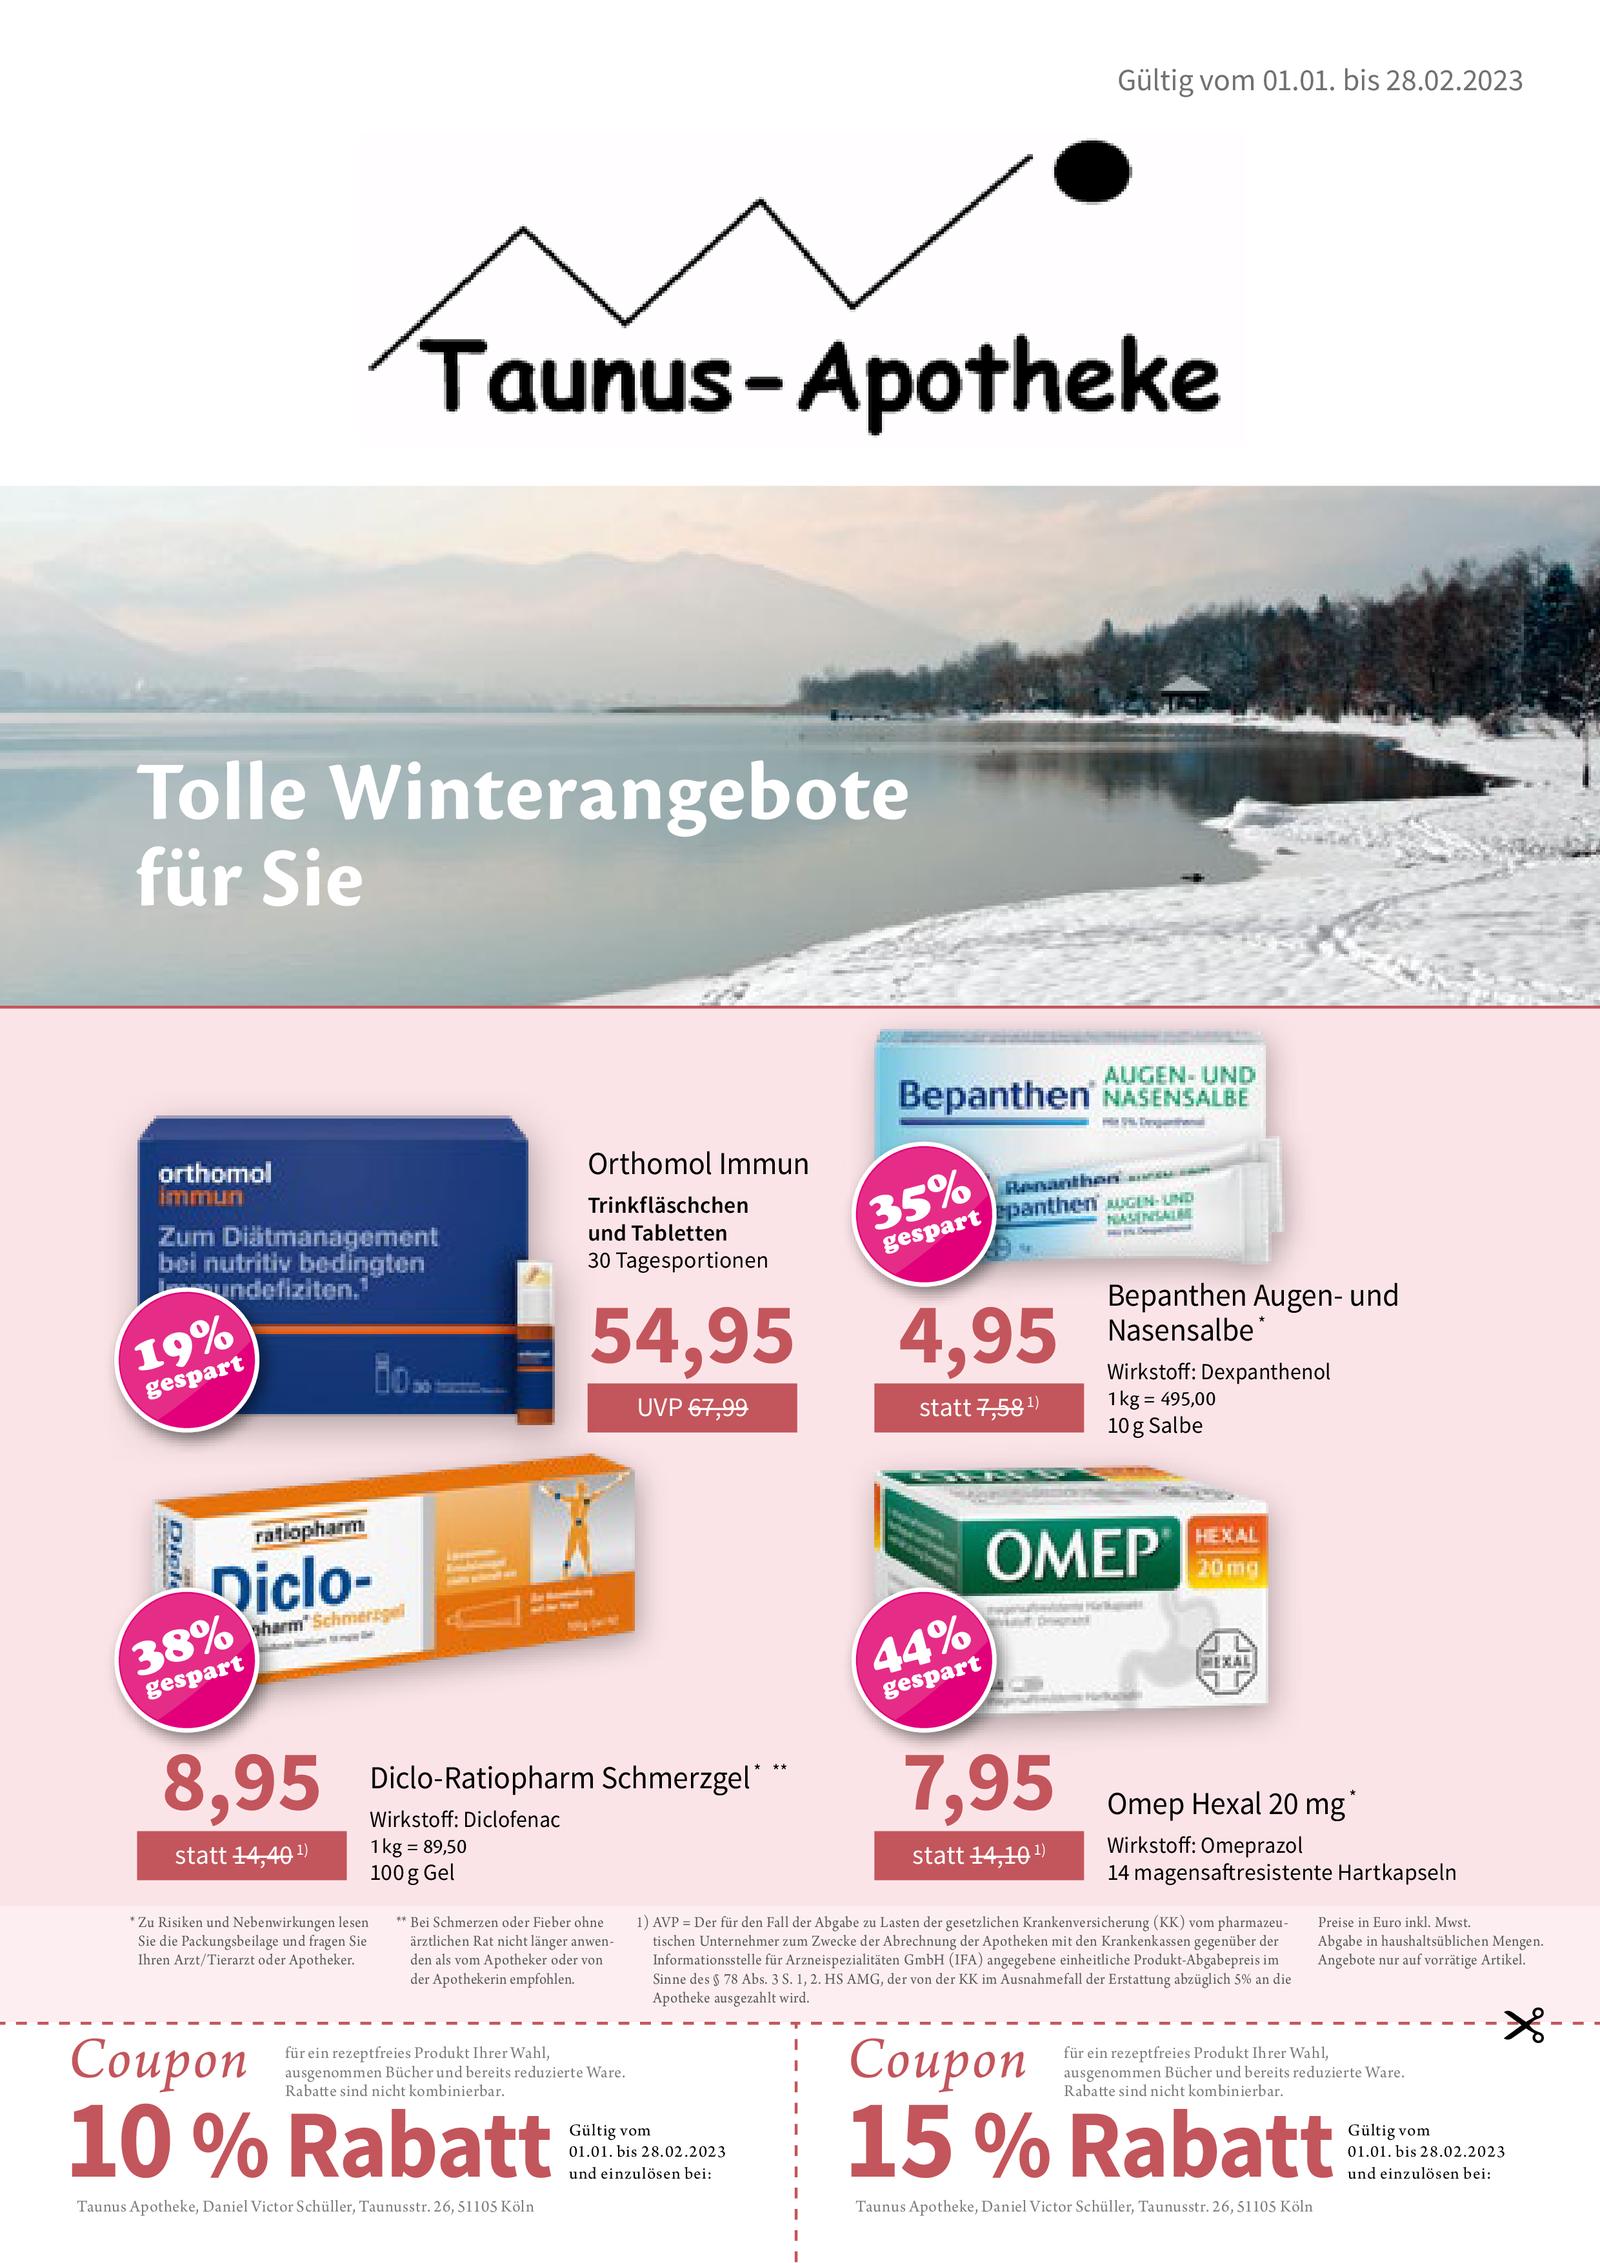 https://mein-uploads.apocdn.net/1762/leaflets/1762_flyer-Seite1.png